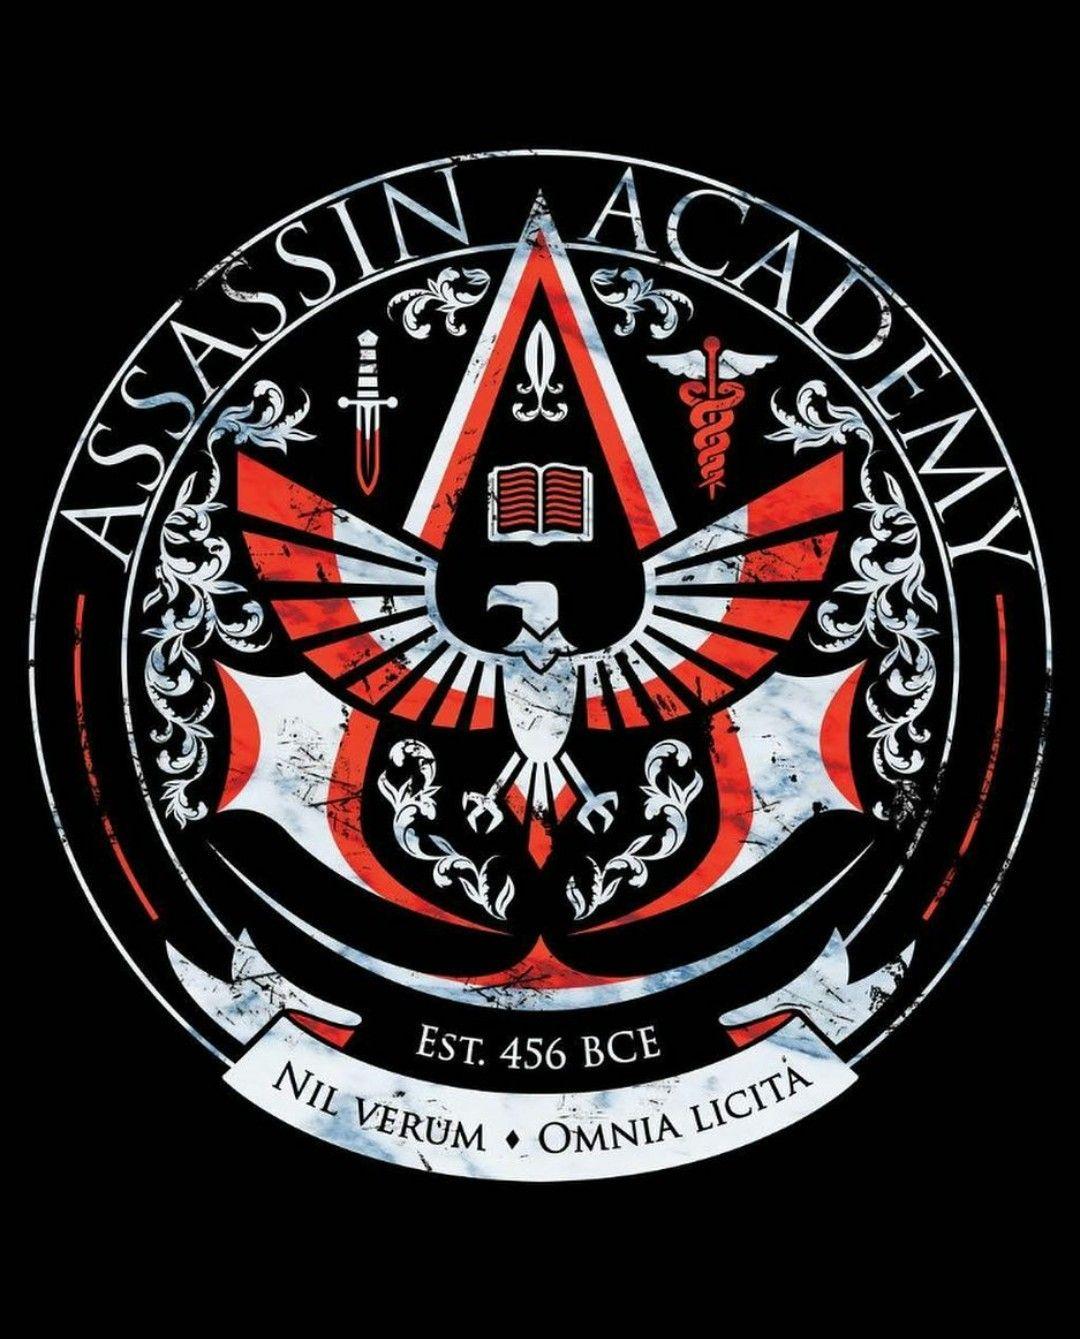 Assassins Academy Assassin's creed, Assassins creed